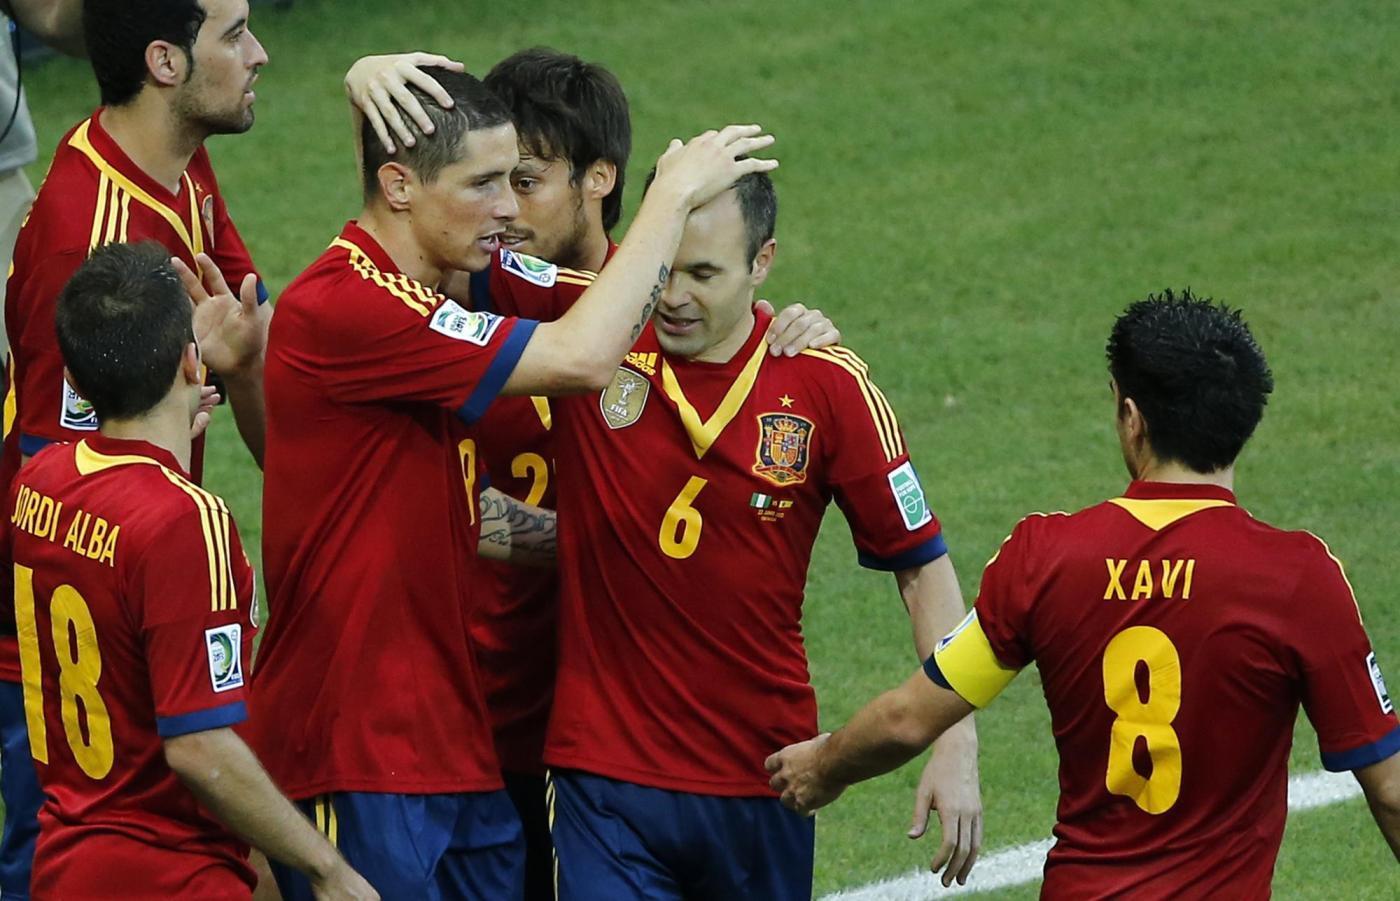 Confederations Cup - Nigeria vs. Spagna